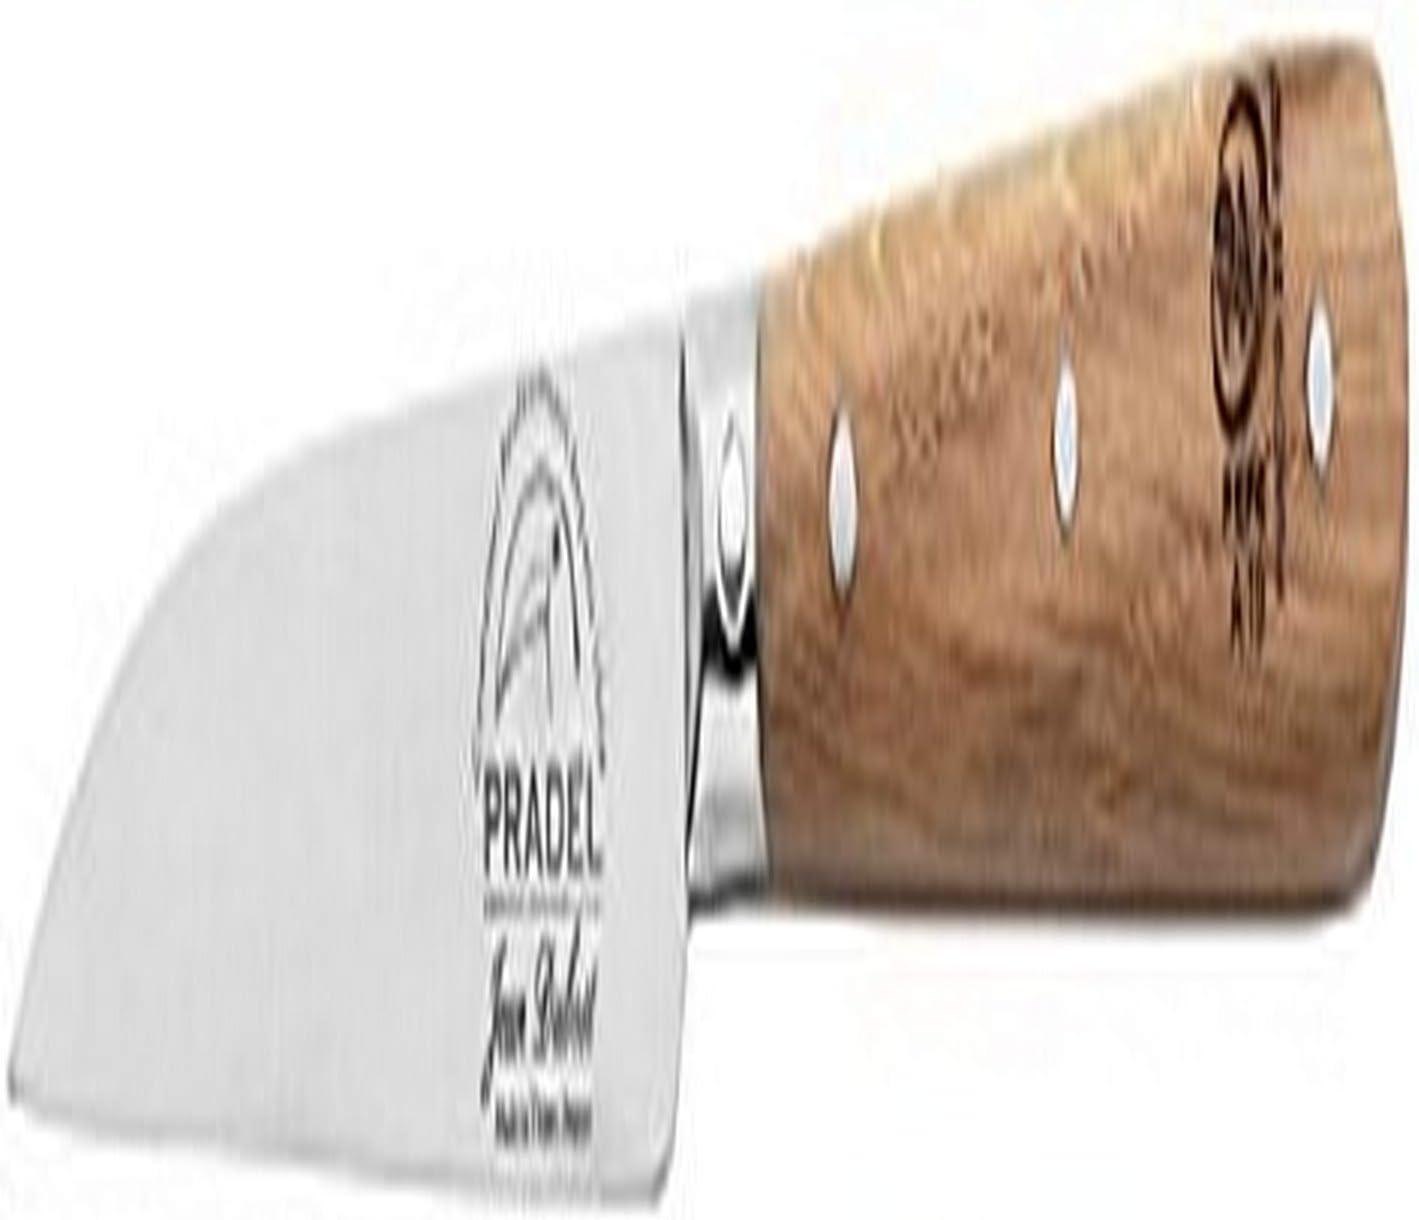 Jean Dubost Pradel 1920 Paring Knife, Wood